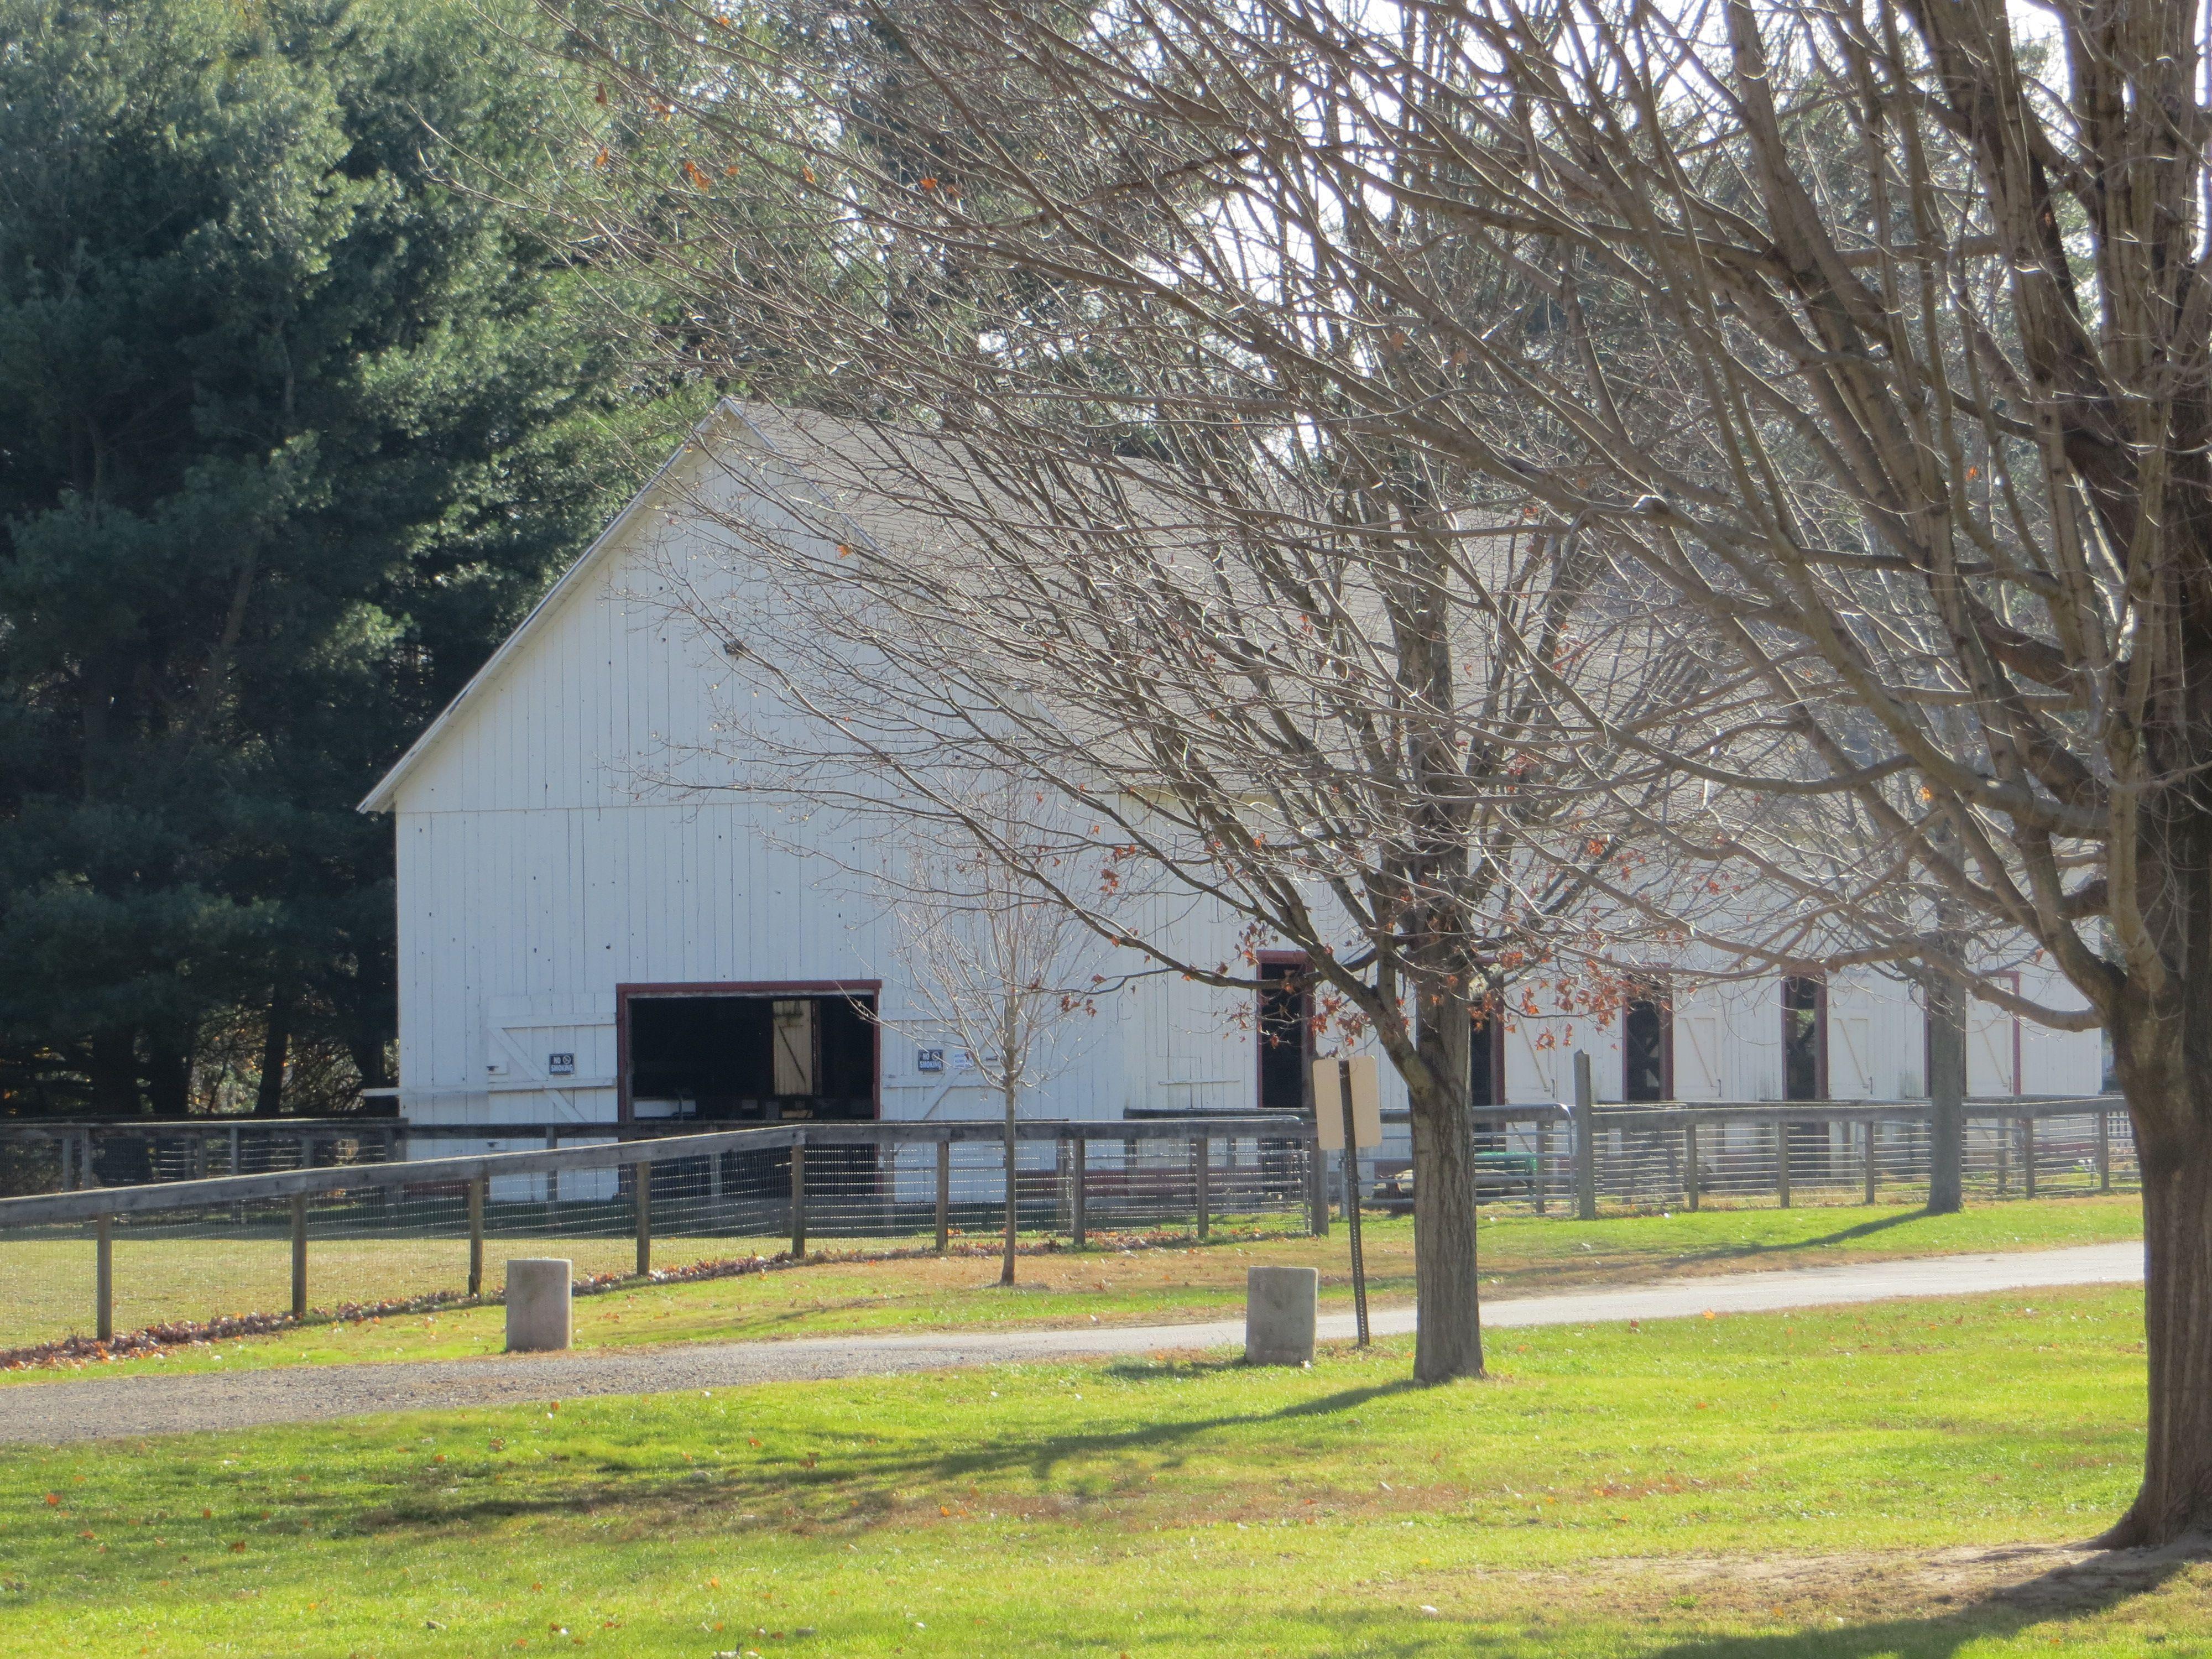 the animal barn